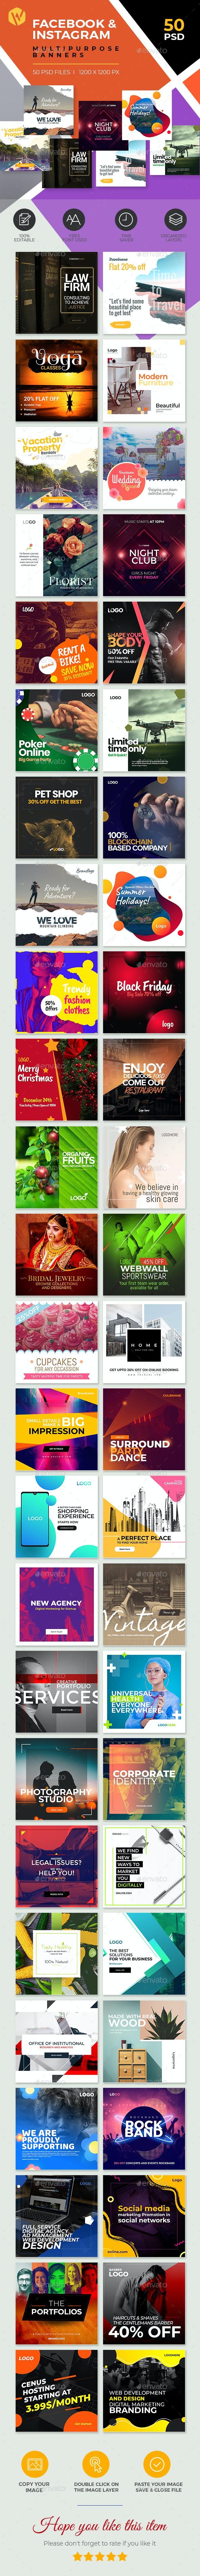 50-Facebook & Instagram Banners - Social Media Web Elements